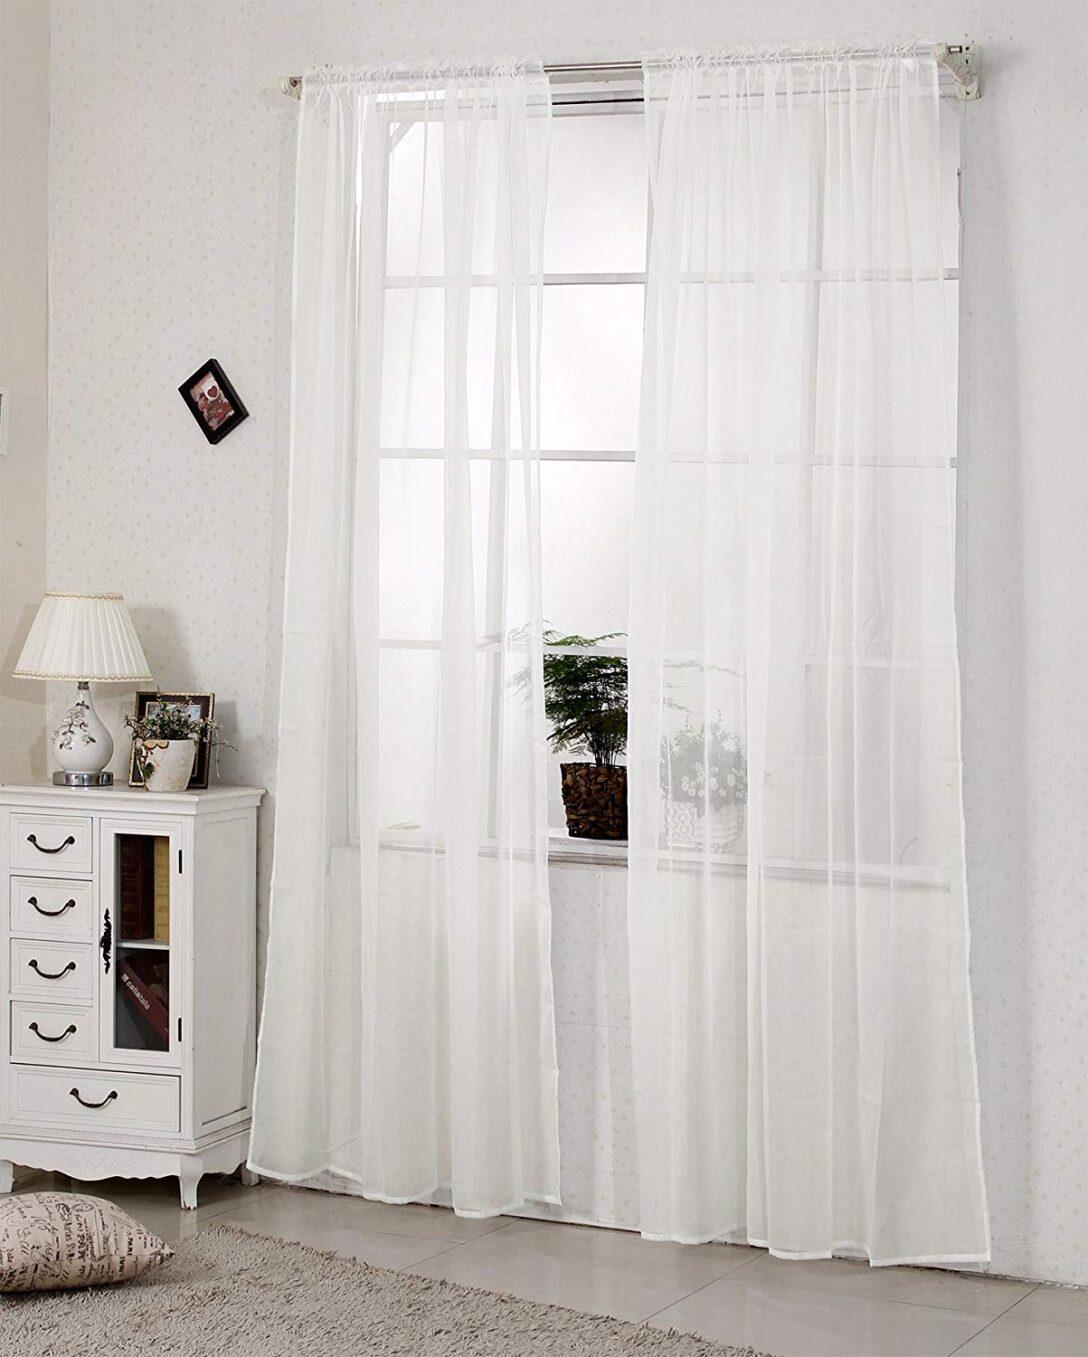 Large Size of 2er Set Gardinen Doppelpack Vorhnge Transparent Mit Kruselband Vorhänge Küche Wohnzimmer Schlafzimmer Wohnzimmer Vorhänge Schiene